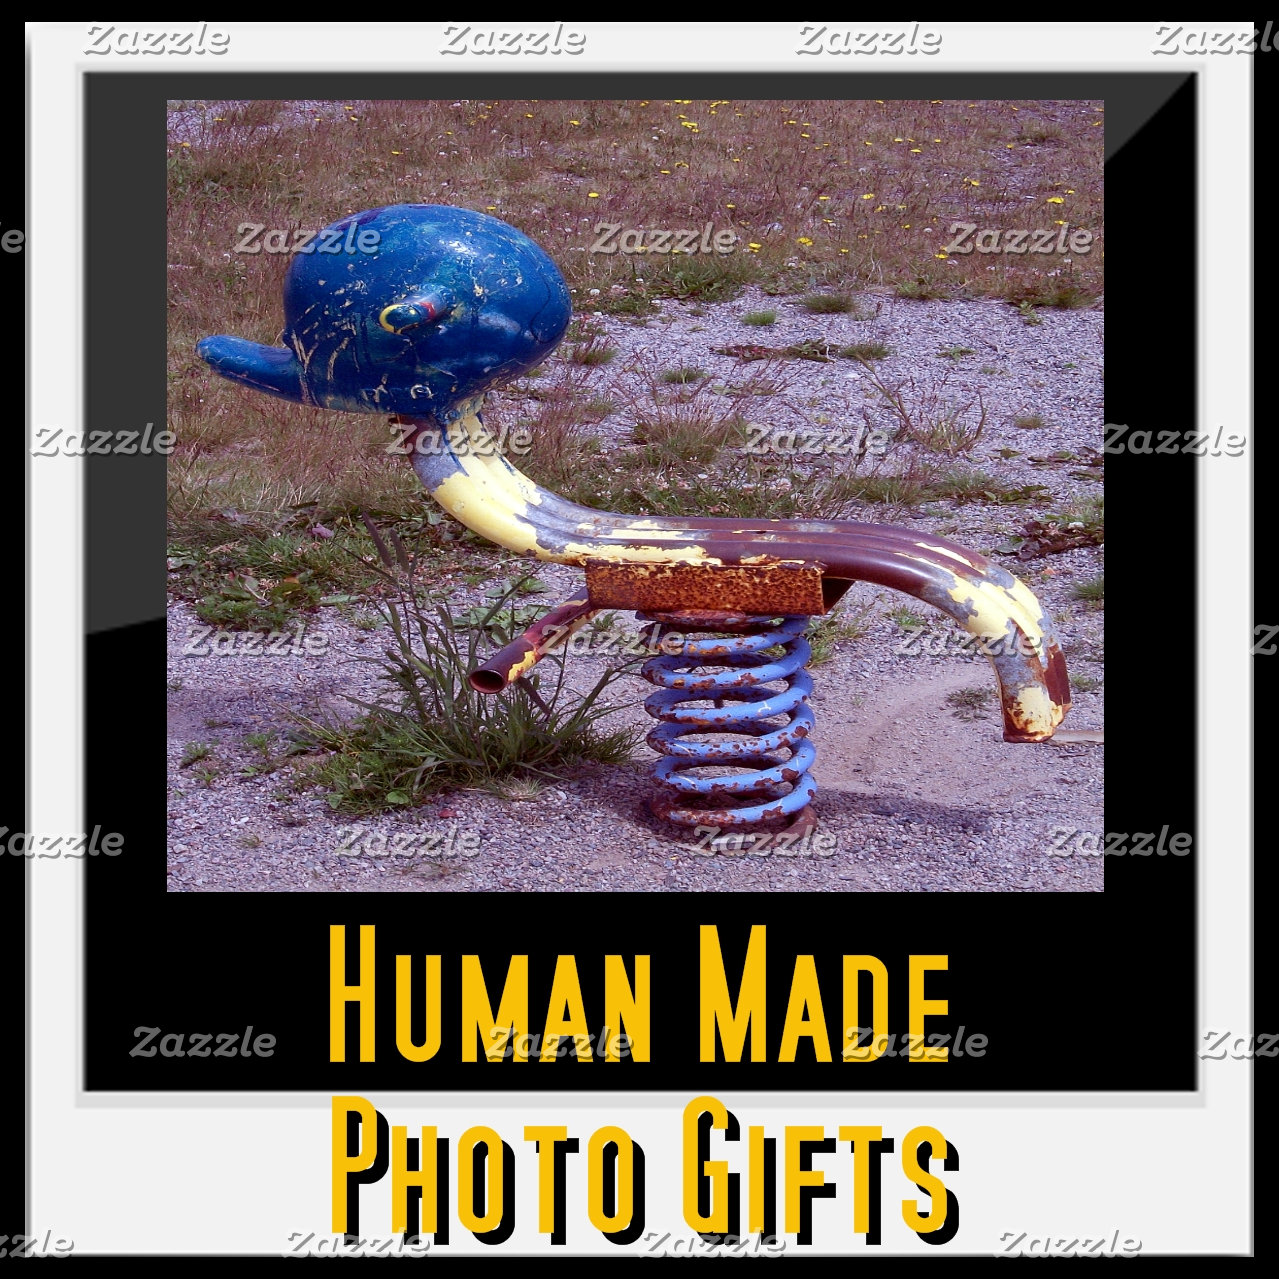 Human Made Photo Gifts